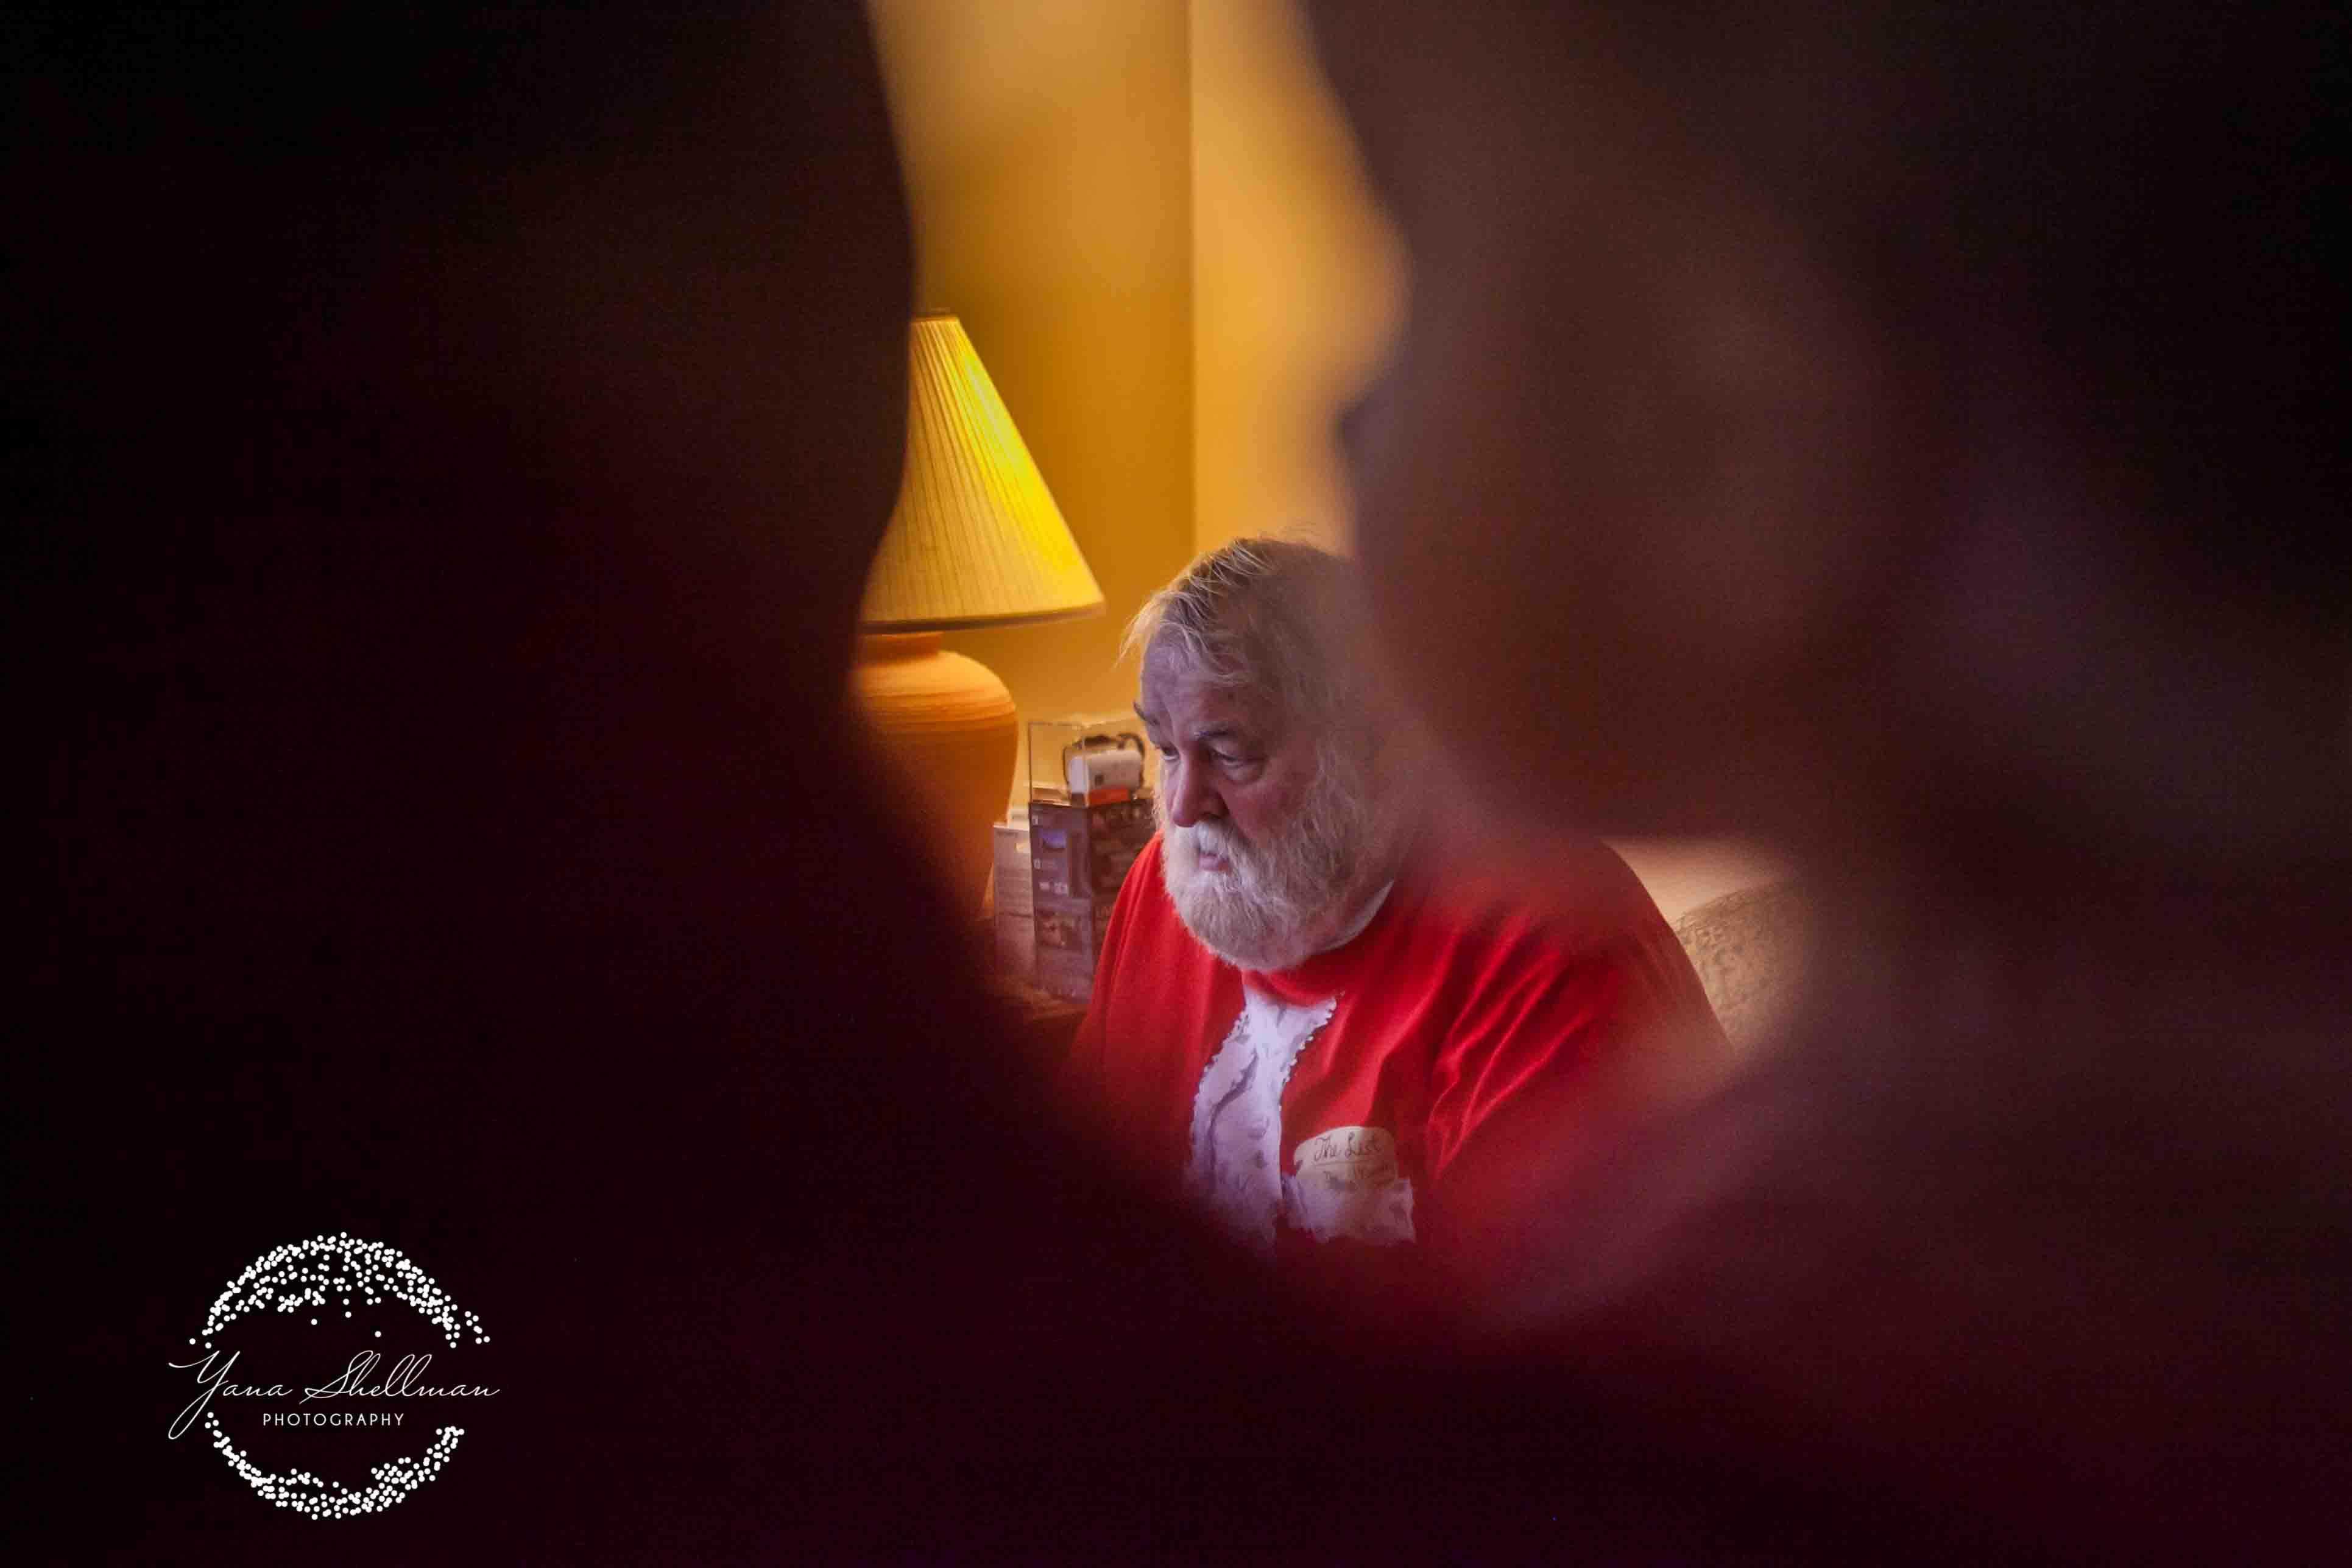 Merry Chritsmas from NJ+Philadelphia Wedding Photographer - Yana Shellman Photography